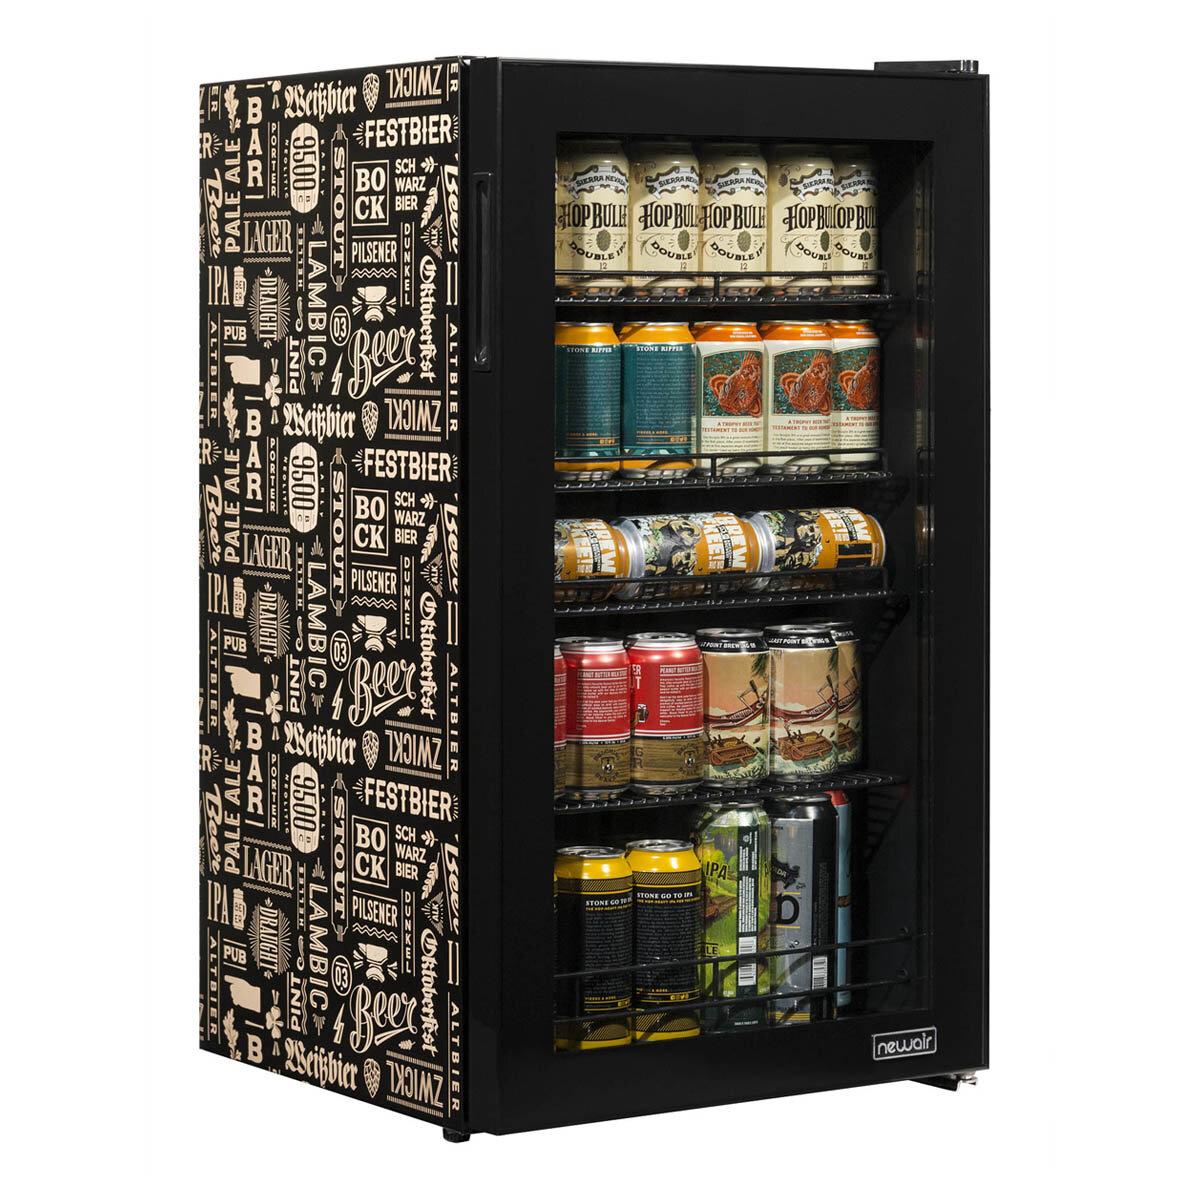 Newair Beers Of The World 126 Can Freestanding Beverage Refrigerator Reviews Wayfair